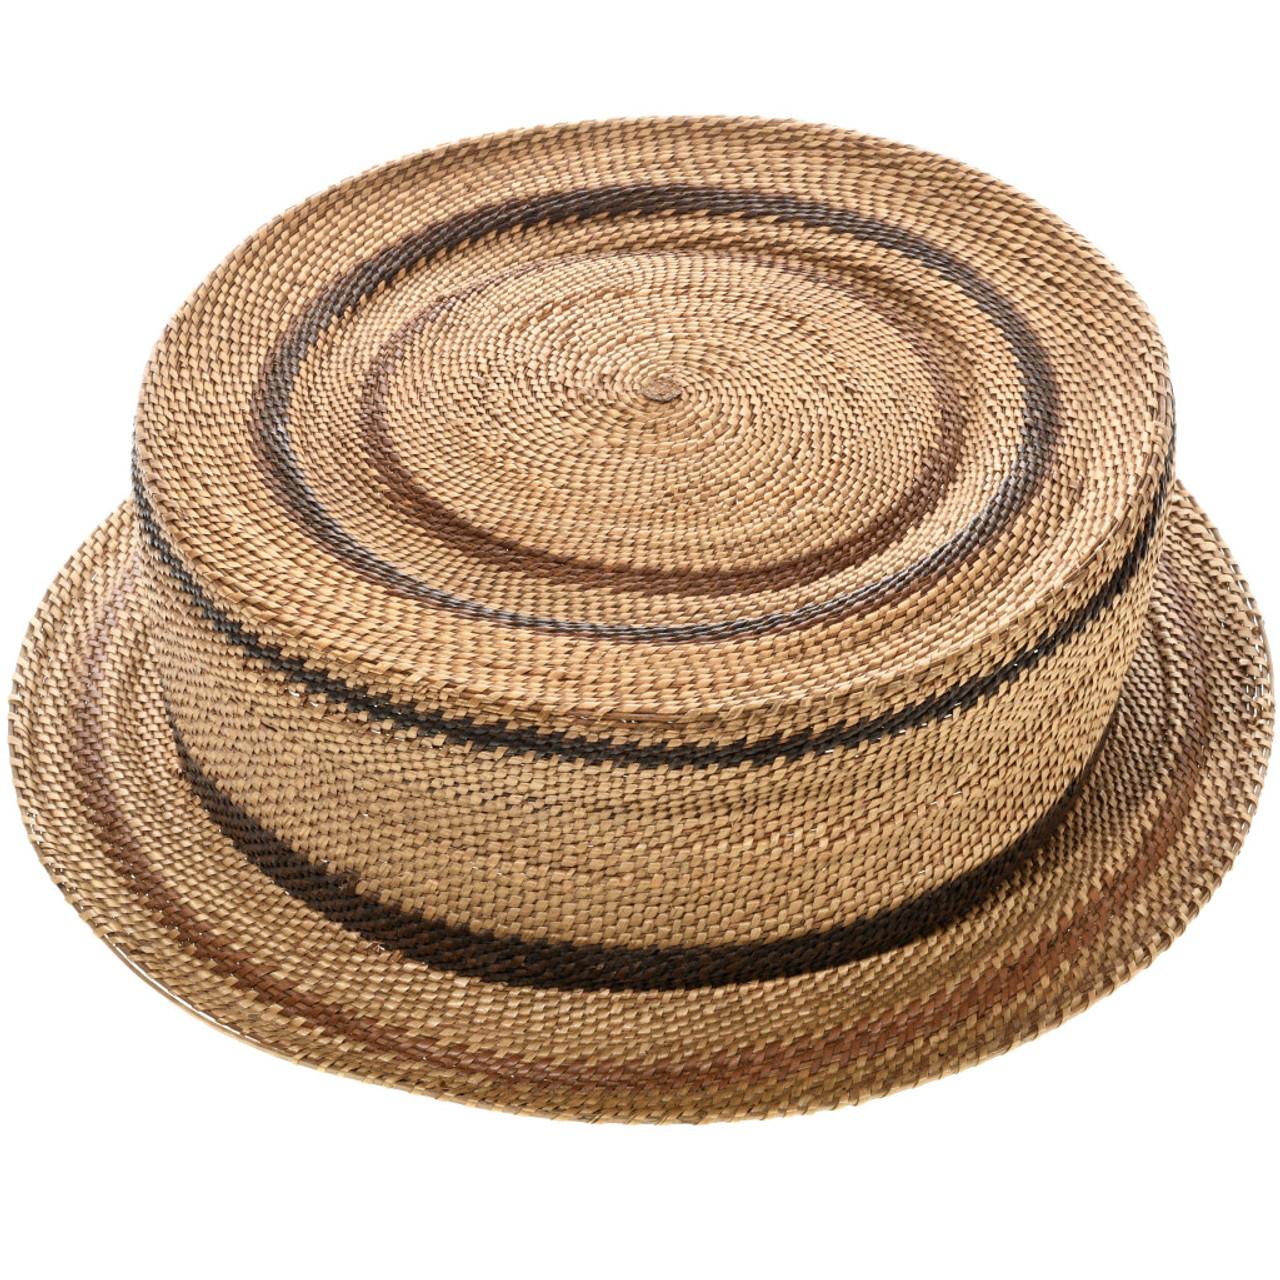 Antique Hupa Tribe Basket Hat 32901 2f2d93b5599